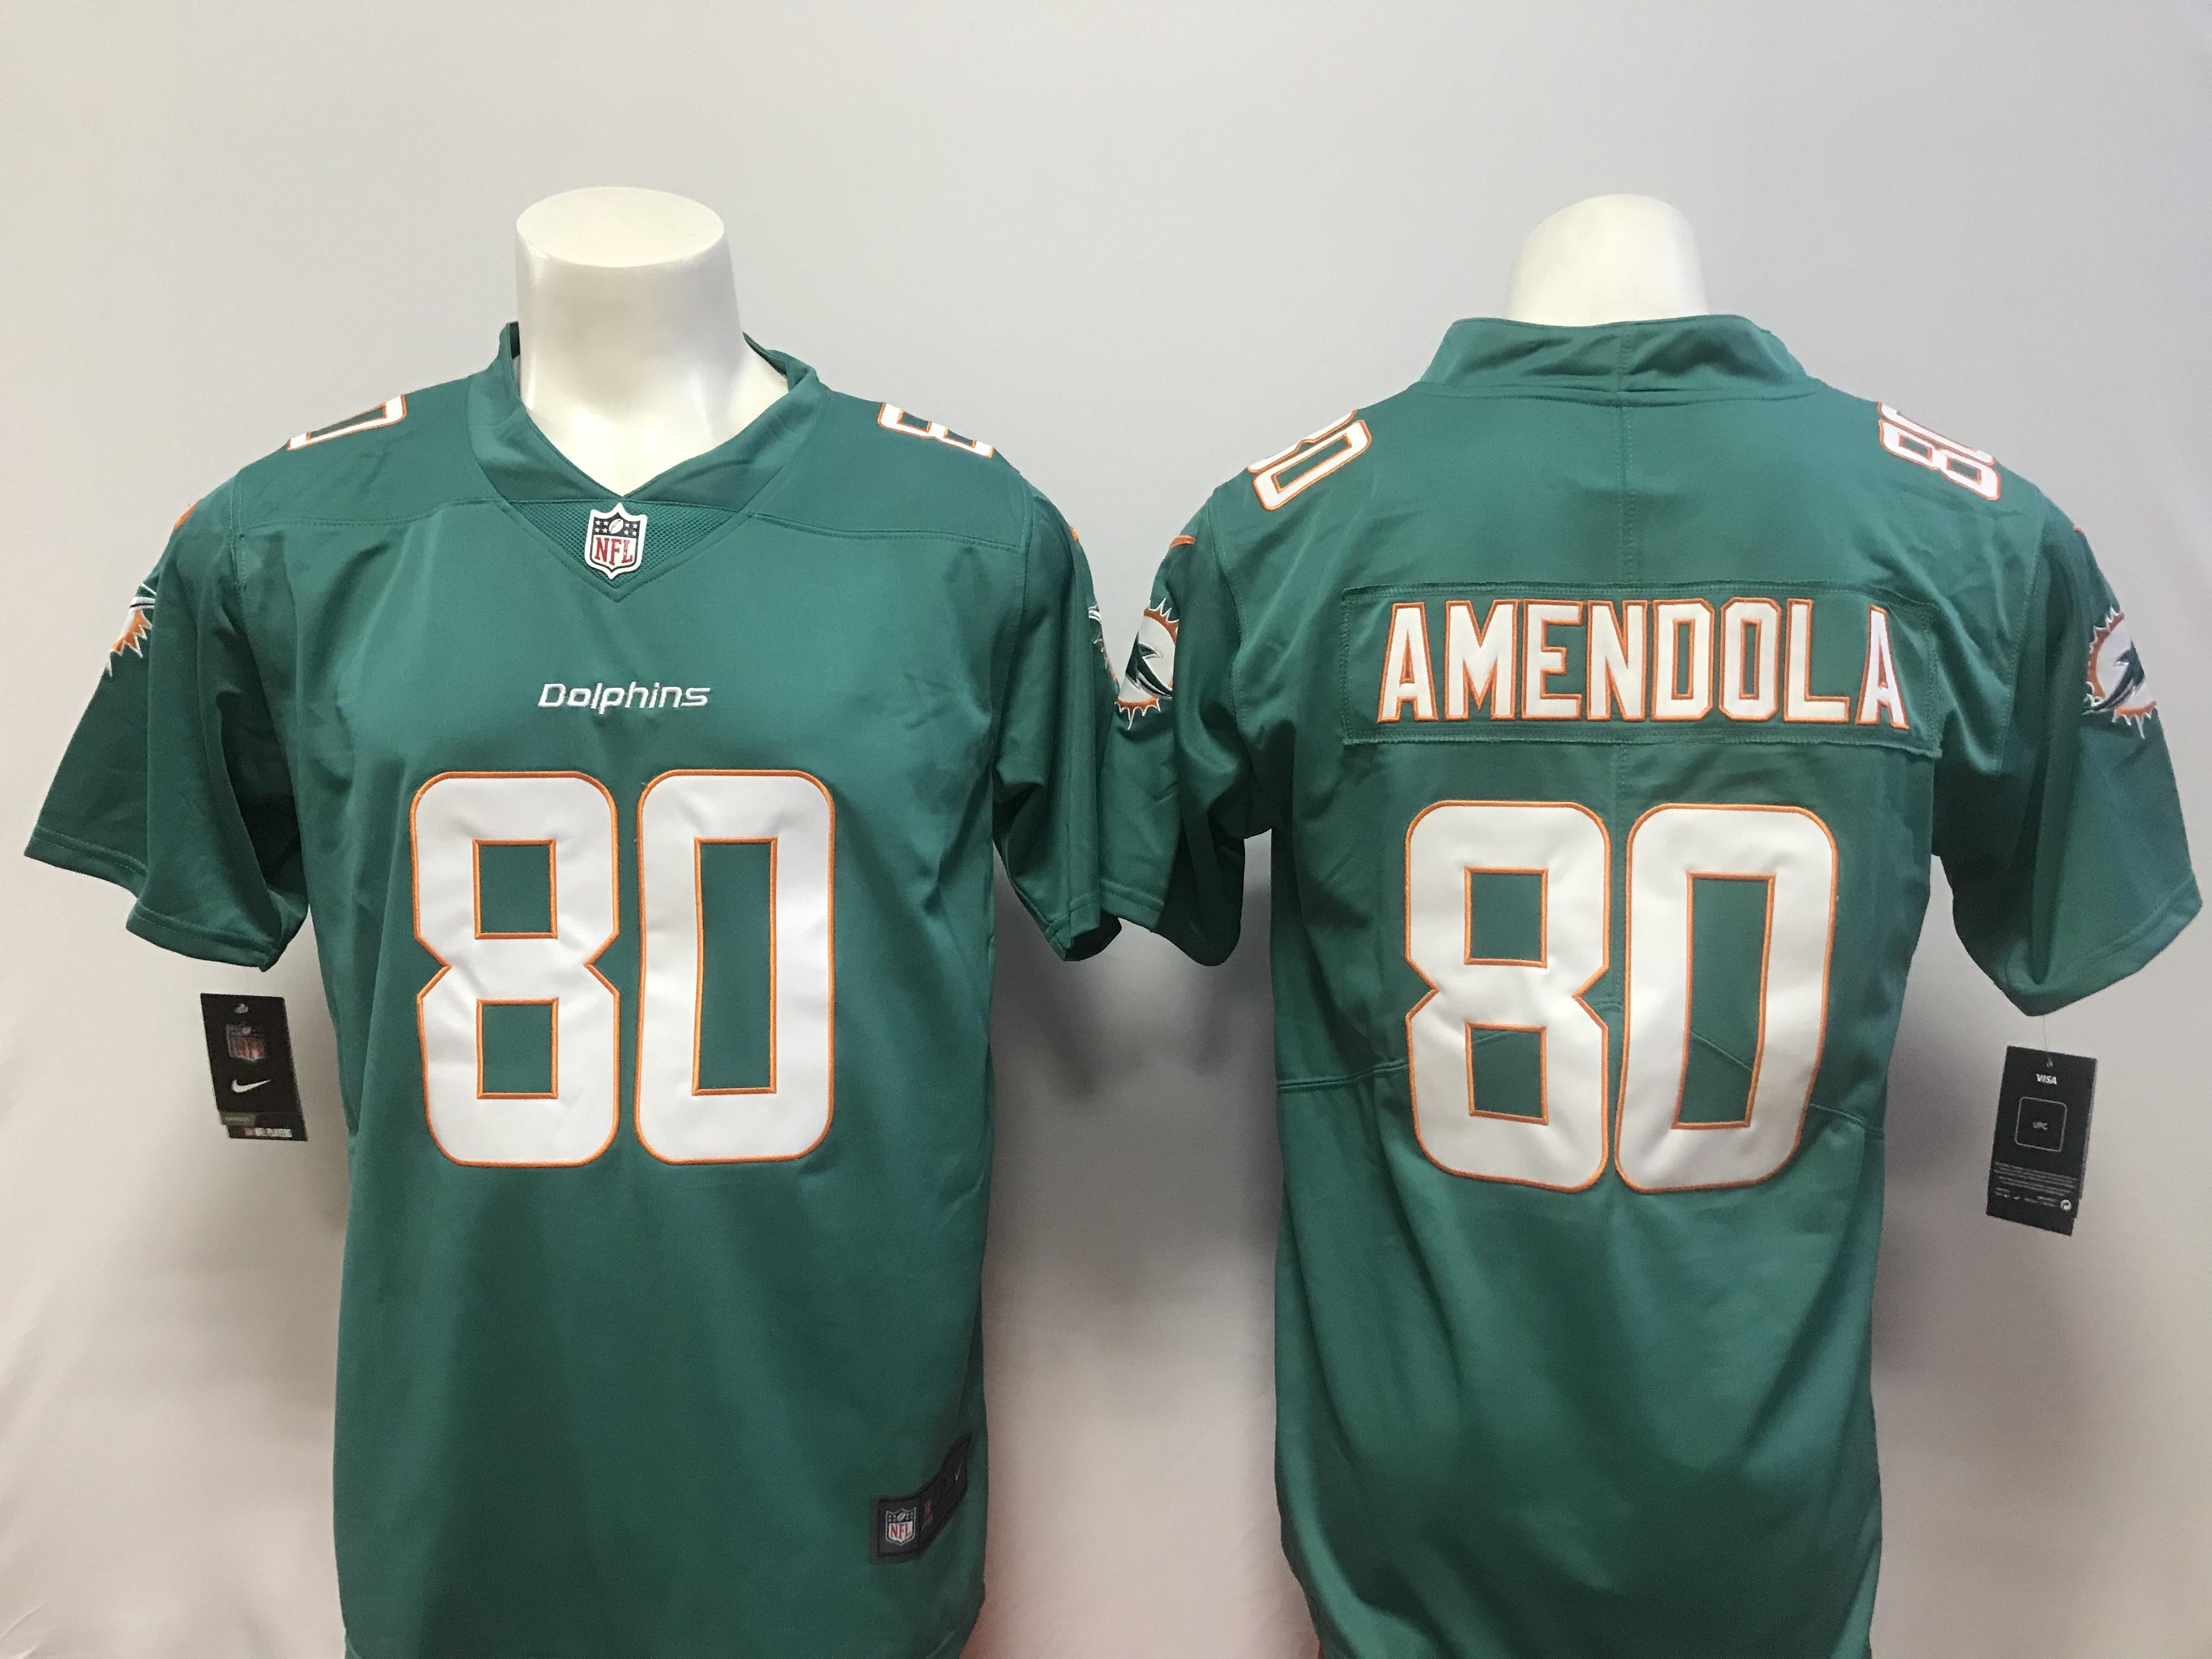 size 40 b8559 bd2a8 US$ 20 - Miami Dolphins #80 Amendola NFL Jersey - MQR - www ...